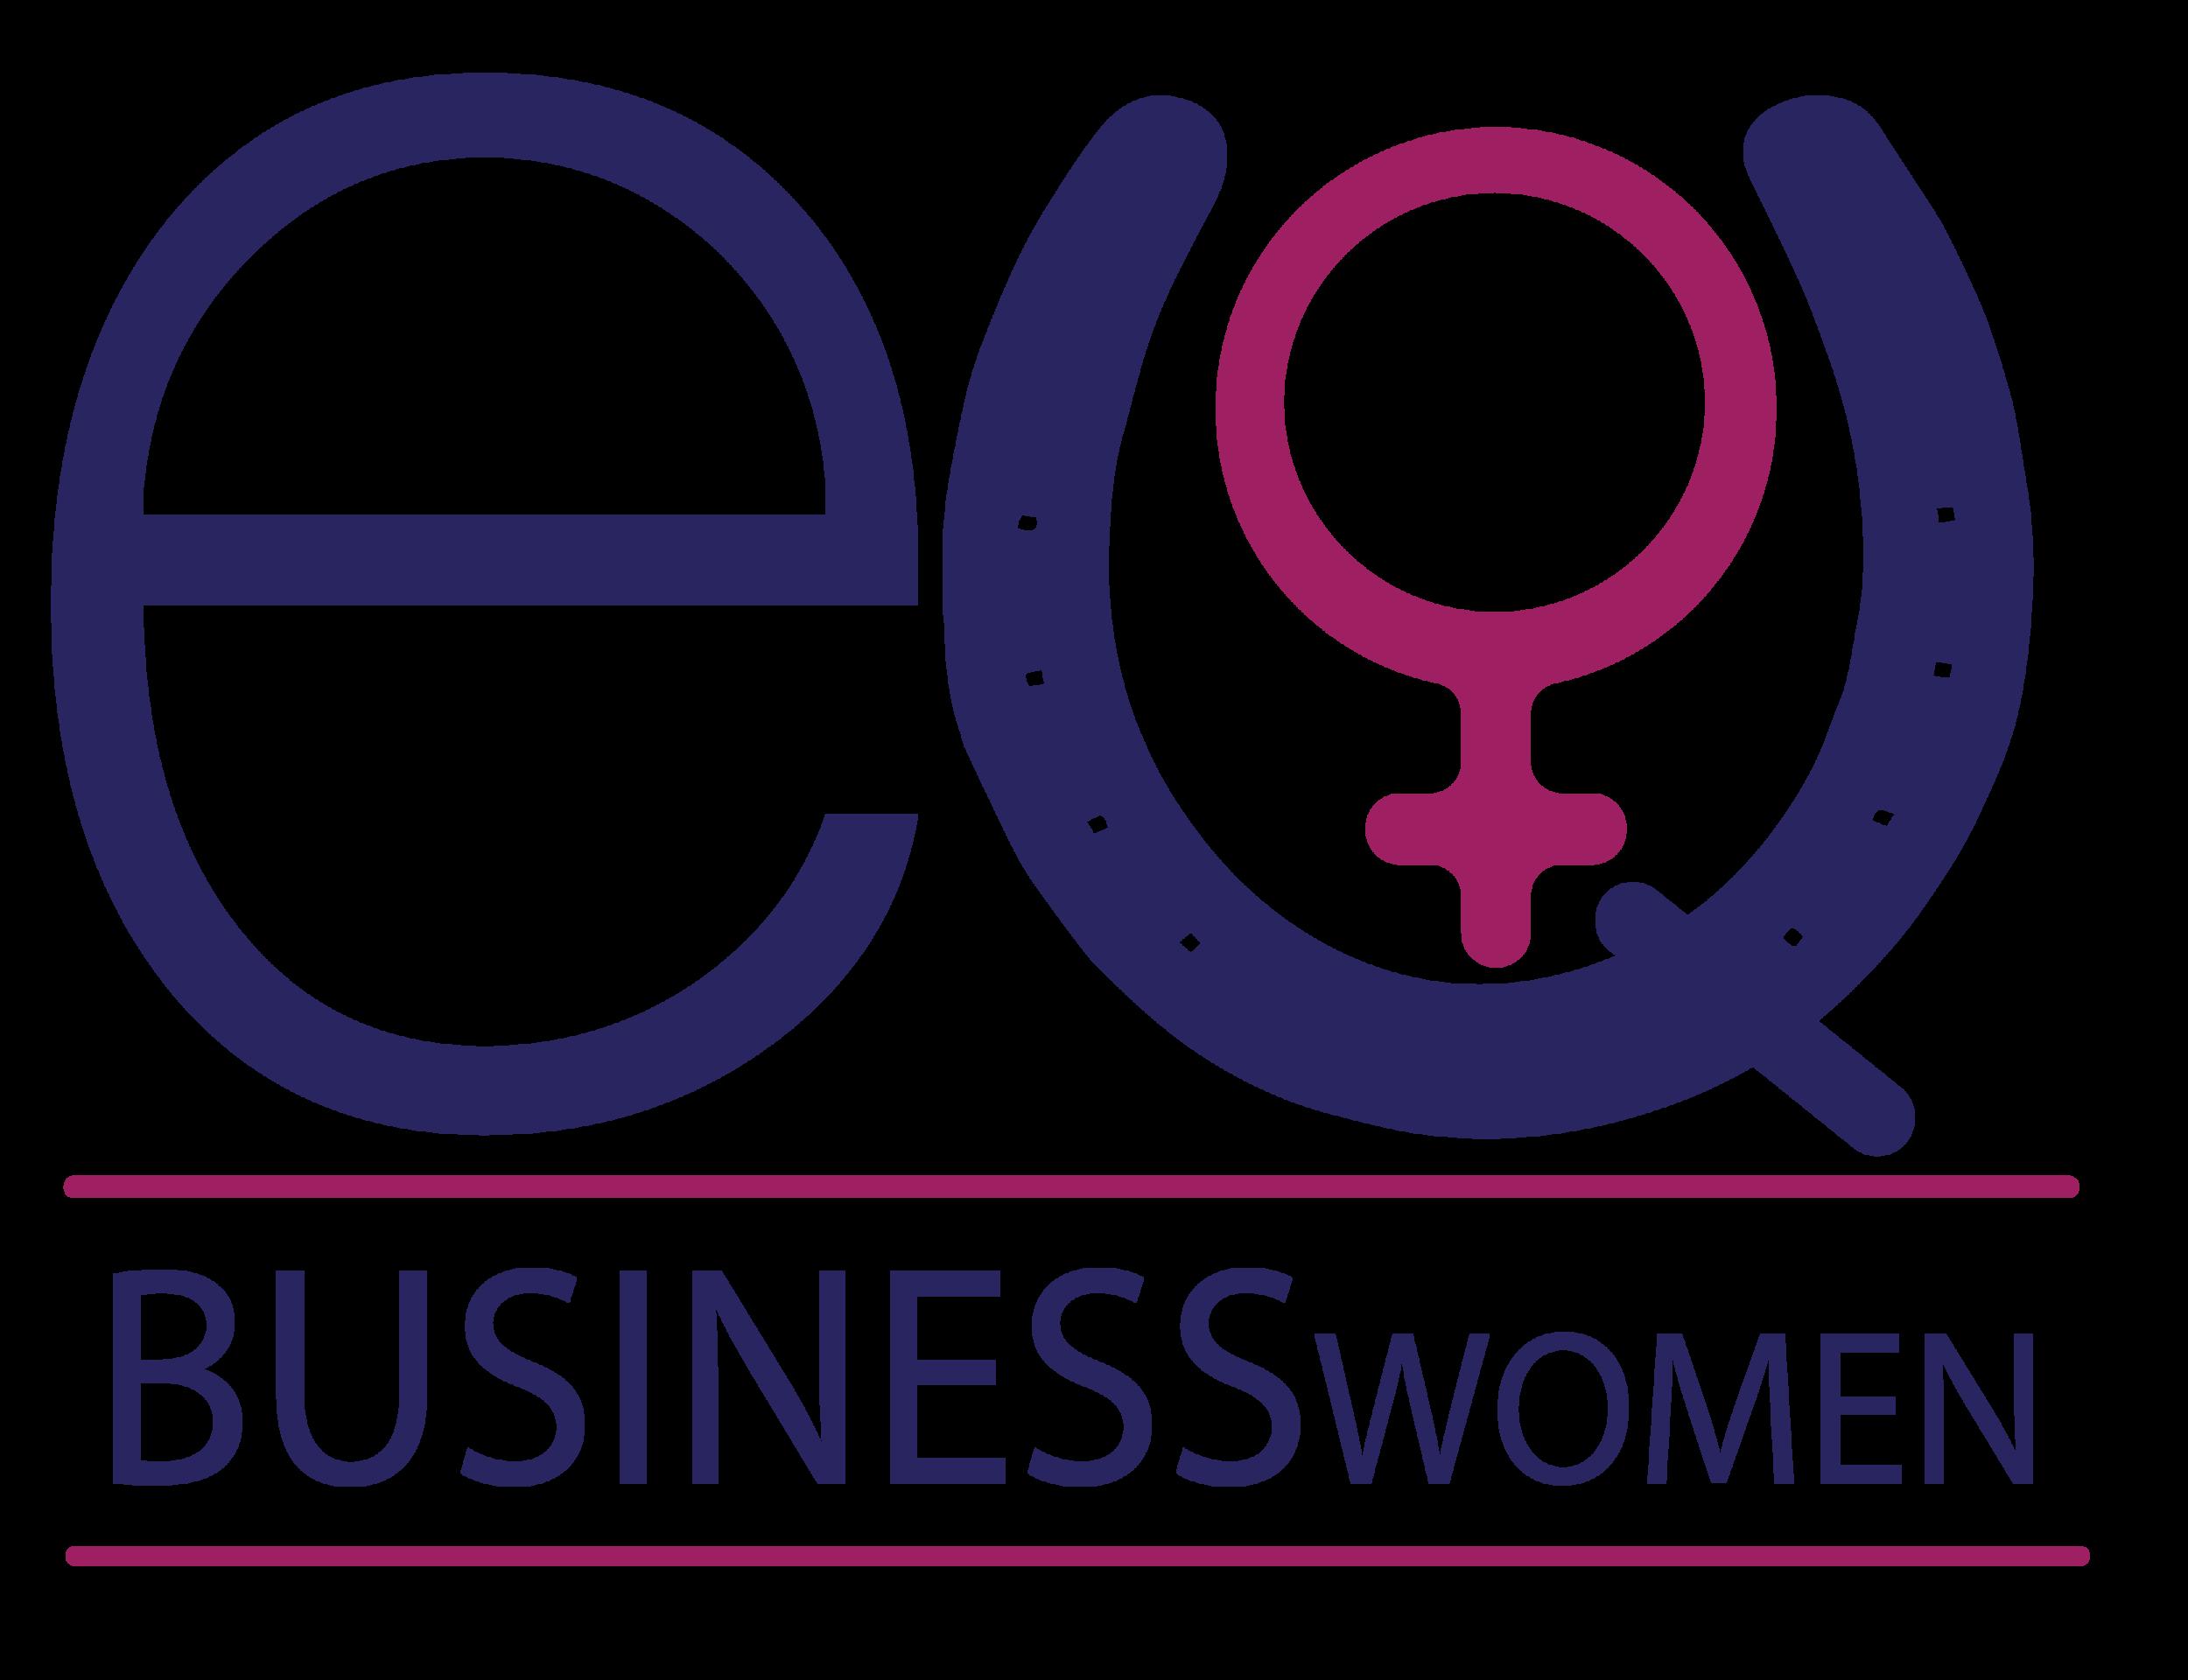 EQ BusinesswomenbayRasperryNavy_web2.png